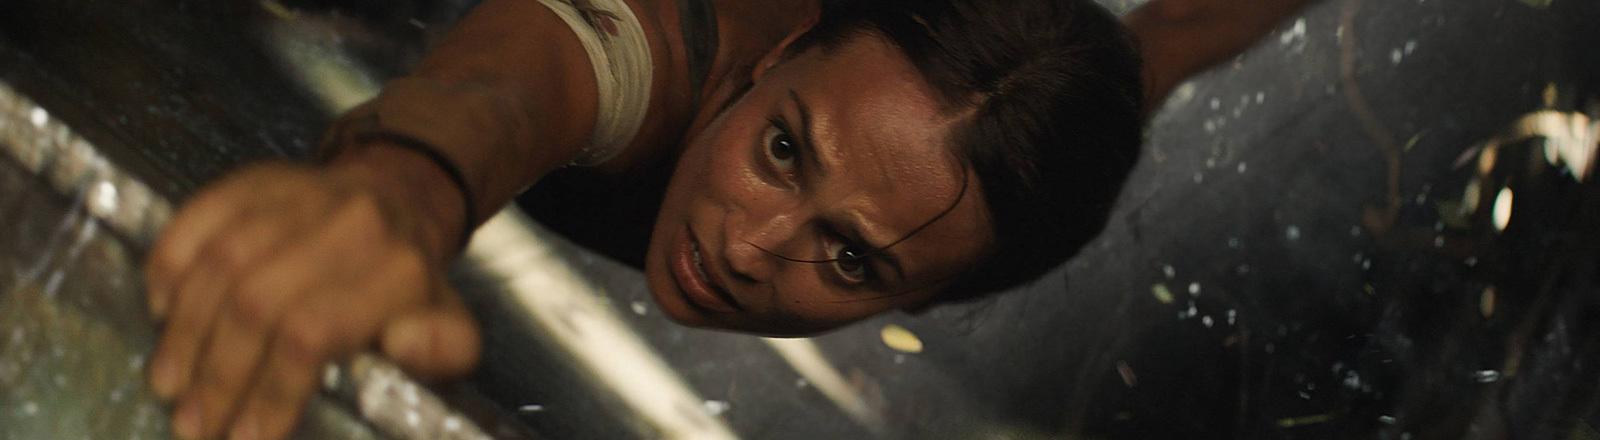 Filmszene aus Tomb Raider